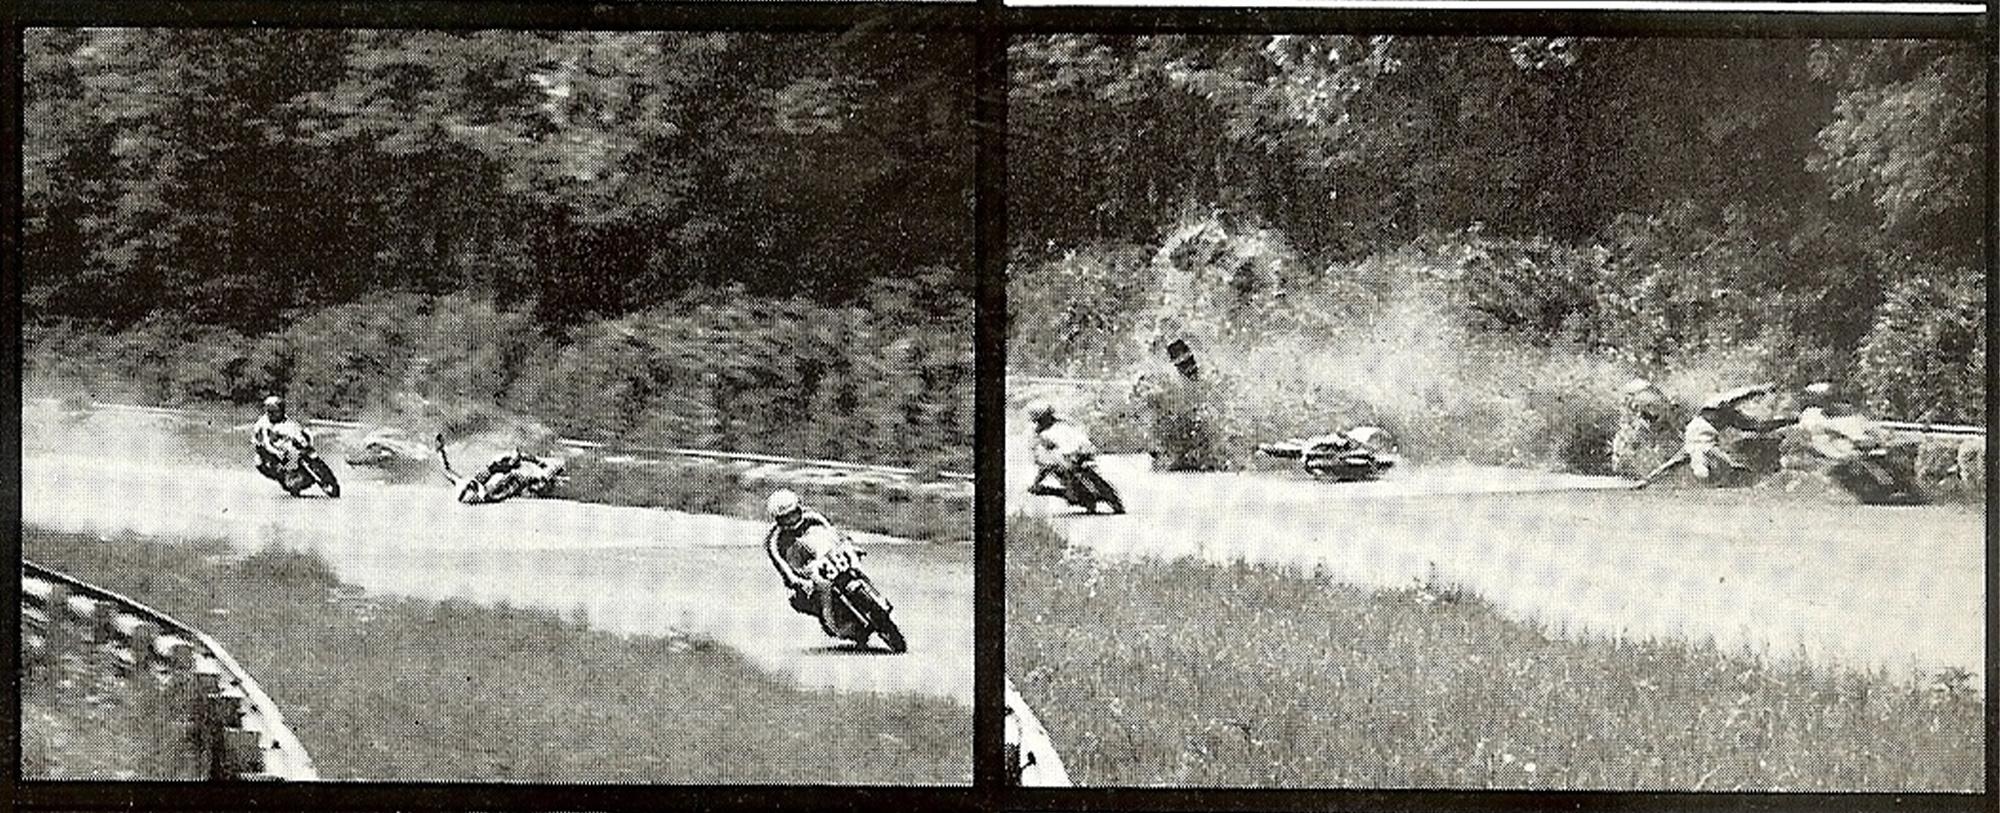 Monza 73 crash